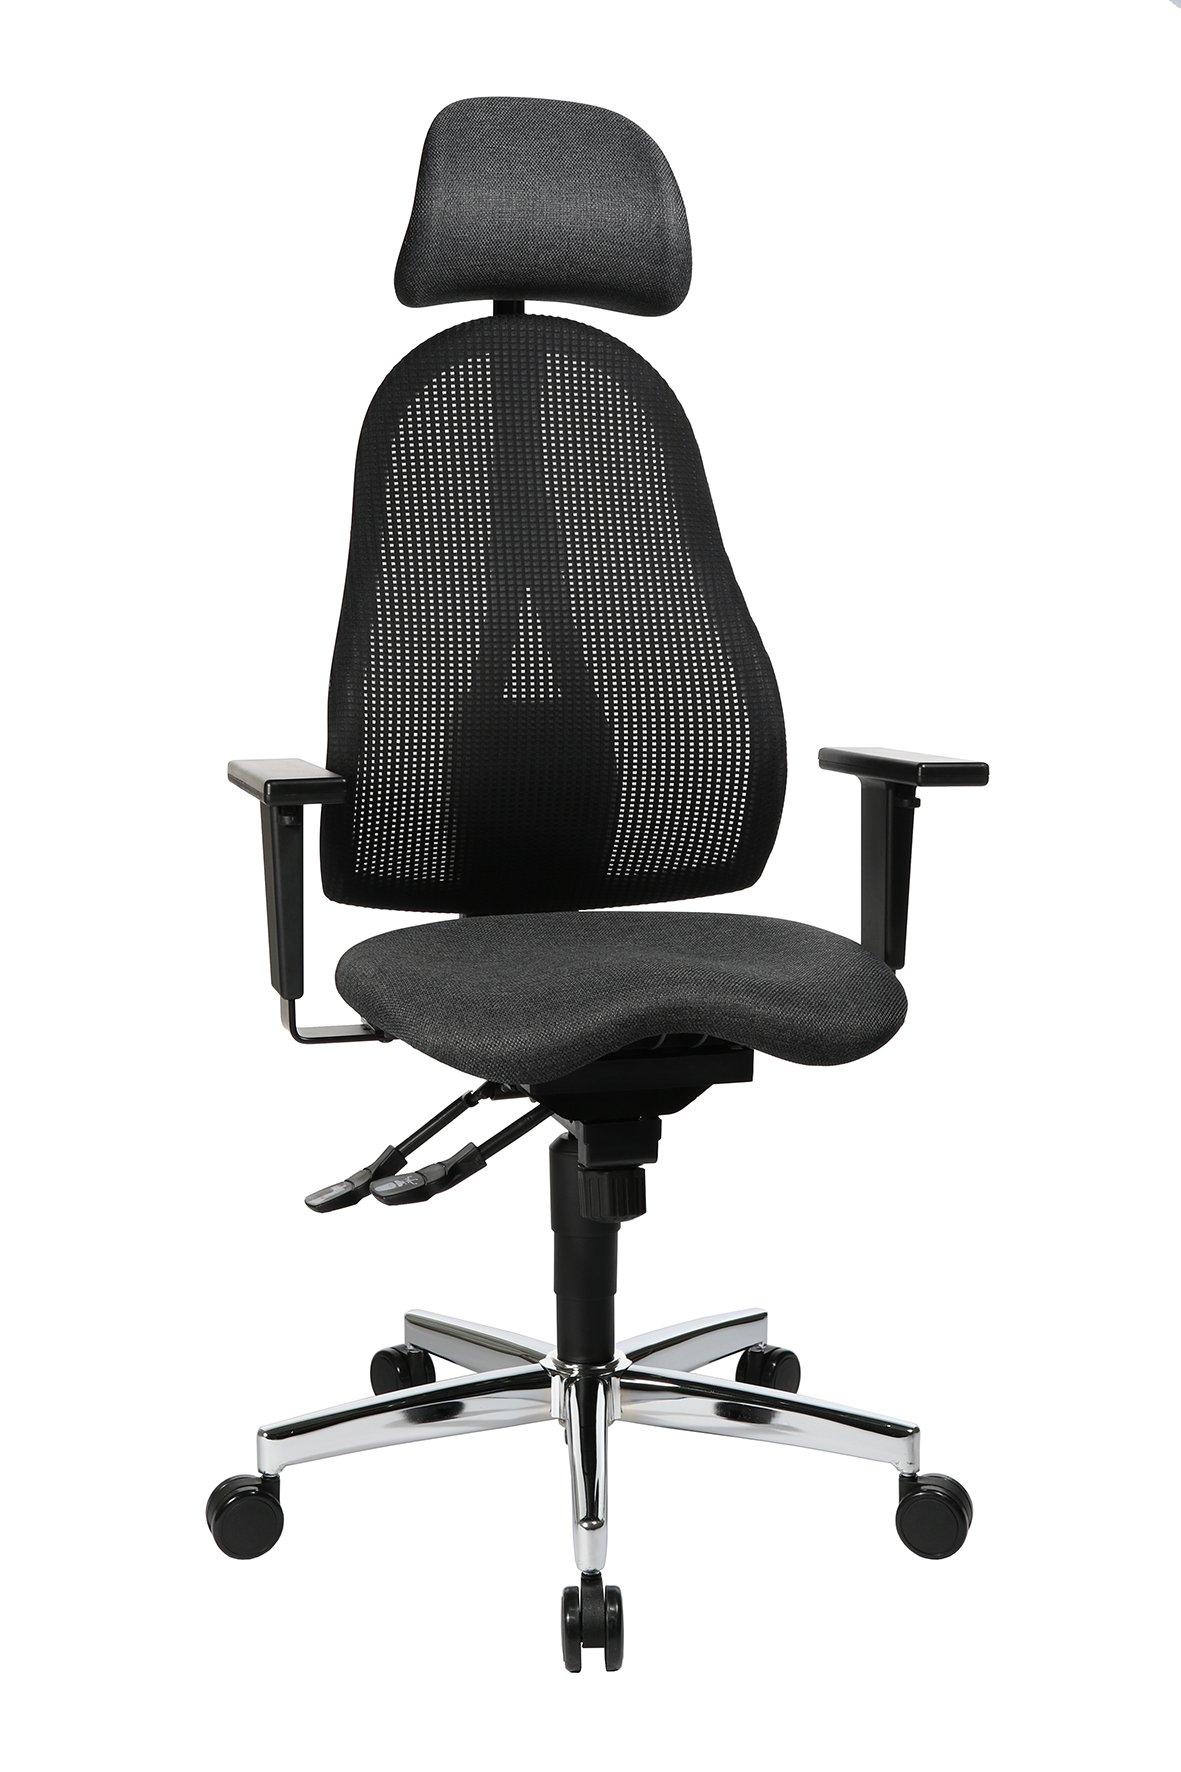 Drehstuhl Sitness Profi 650,schwarz / anthrazit,Stahl